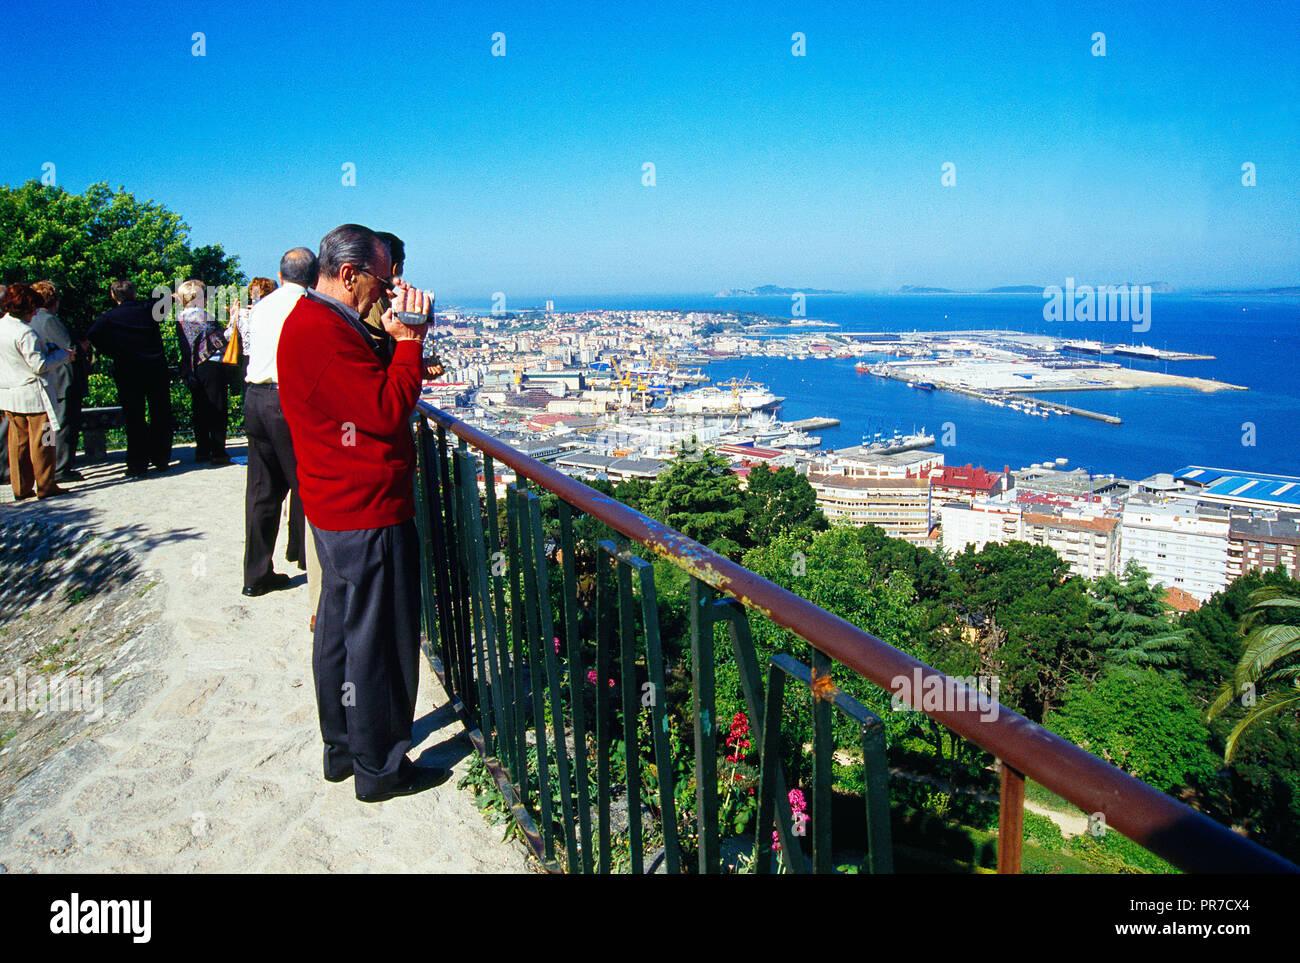 People at the viewpoint. El Castro, Vigo, Pontevedra province, Galicia, Spain. - Stock Image